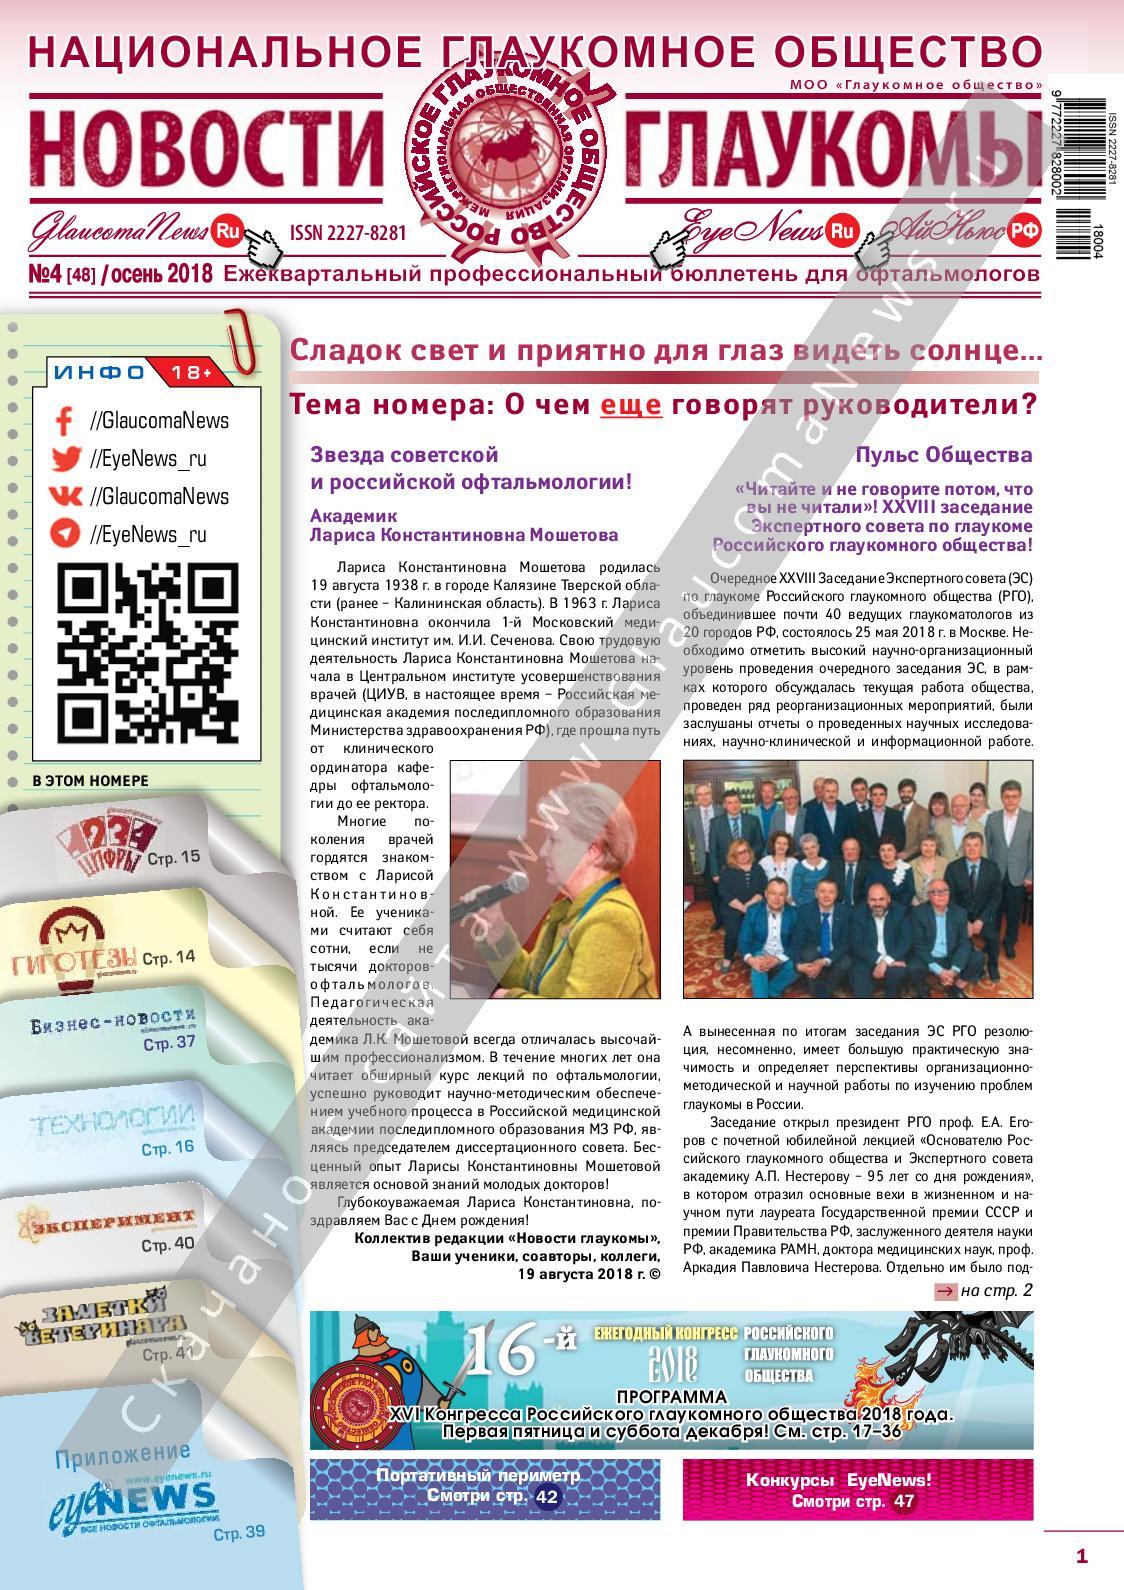 efa9ed1a0e76 Calaméo - НОВОСТИ ГЛАУКОМЫ №4, 2018 (осень)